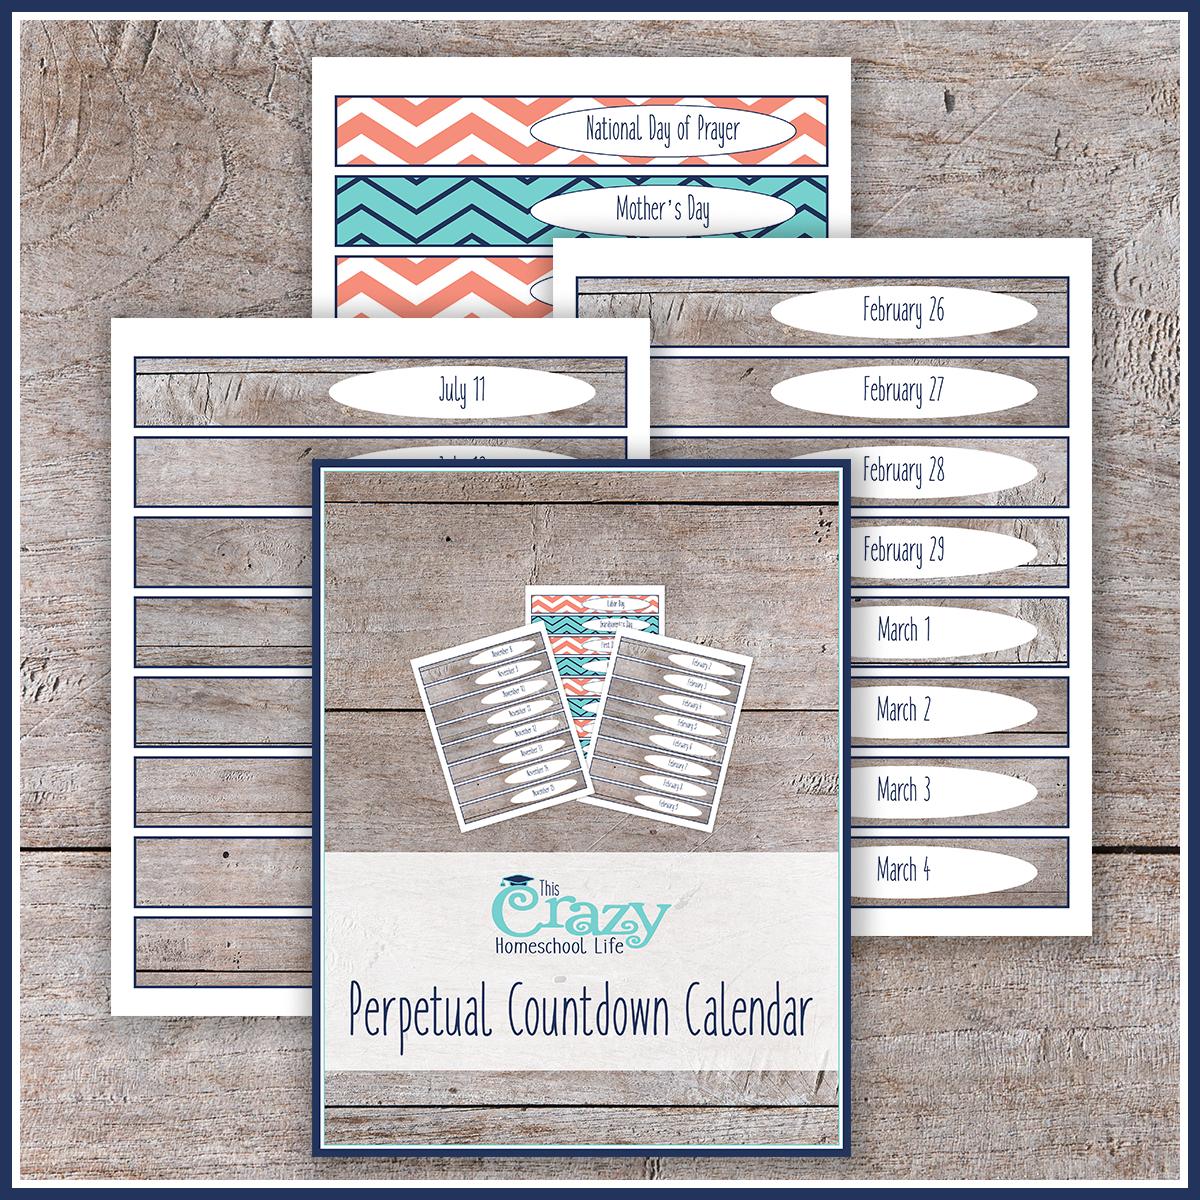 The Printable Perpetual Countdown Calendar regarding Make A Countdown Calendar Printable